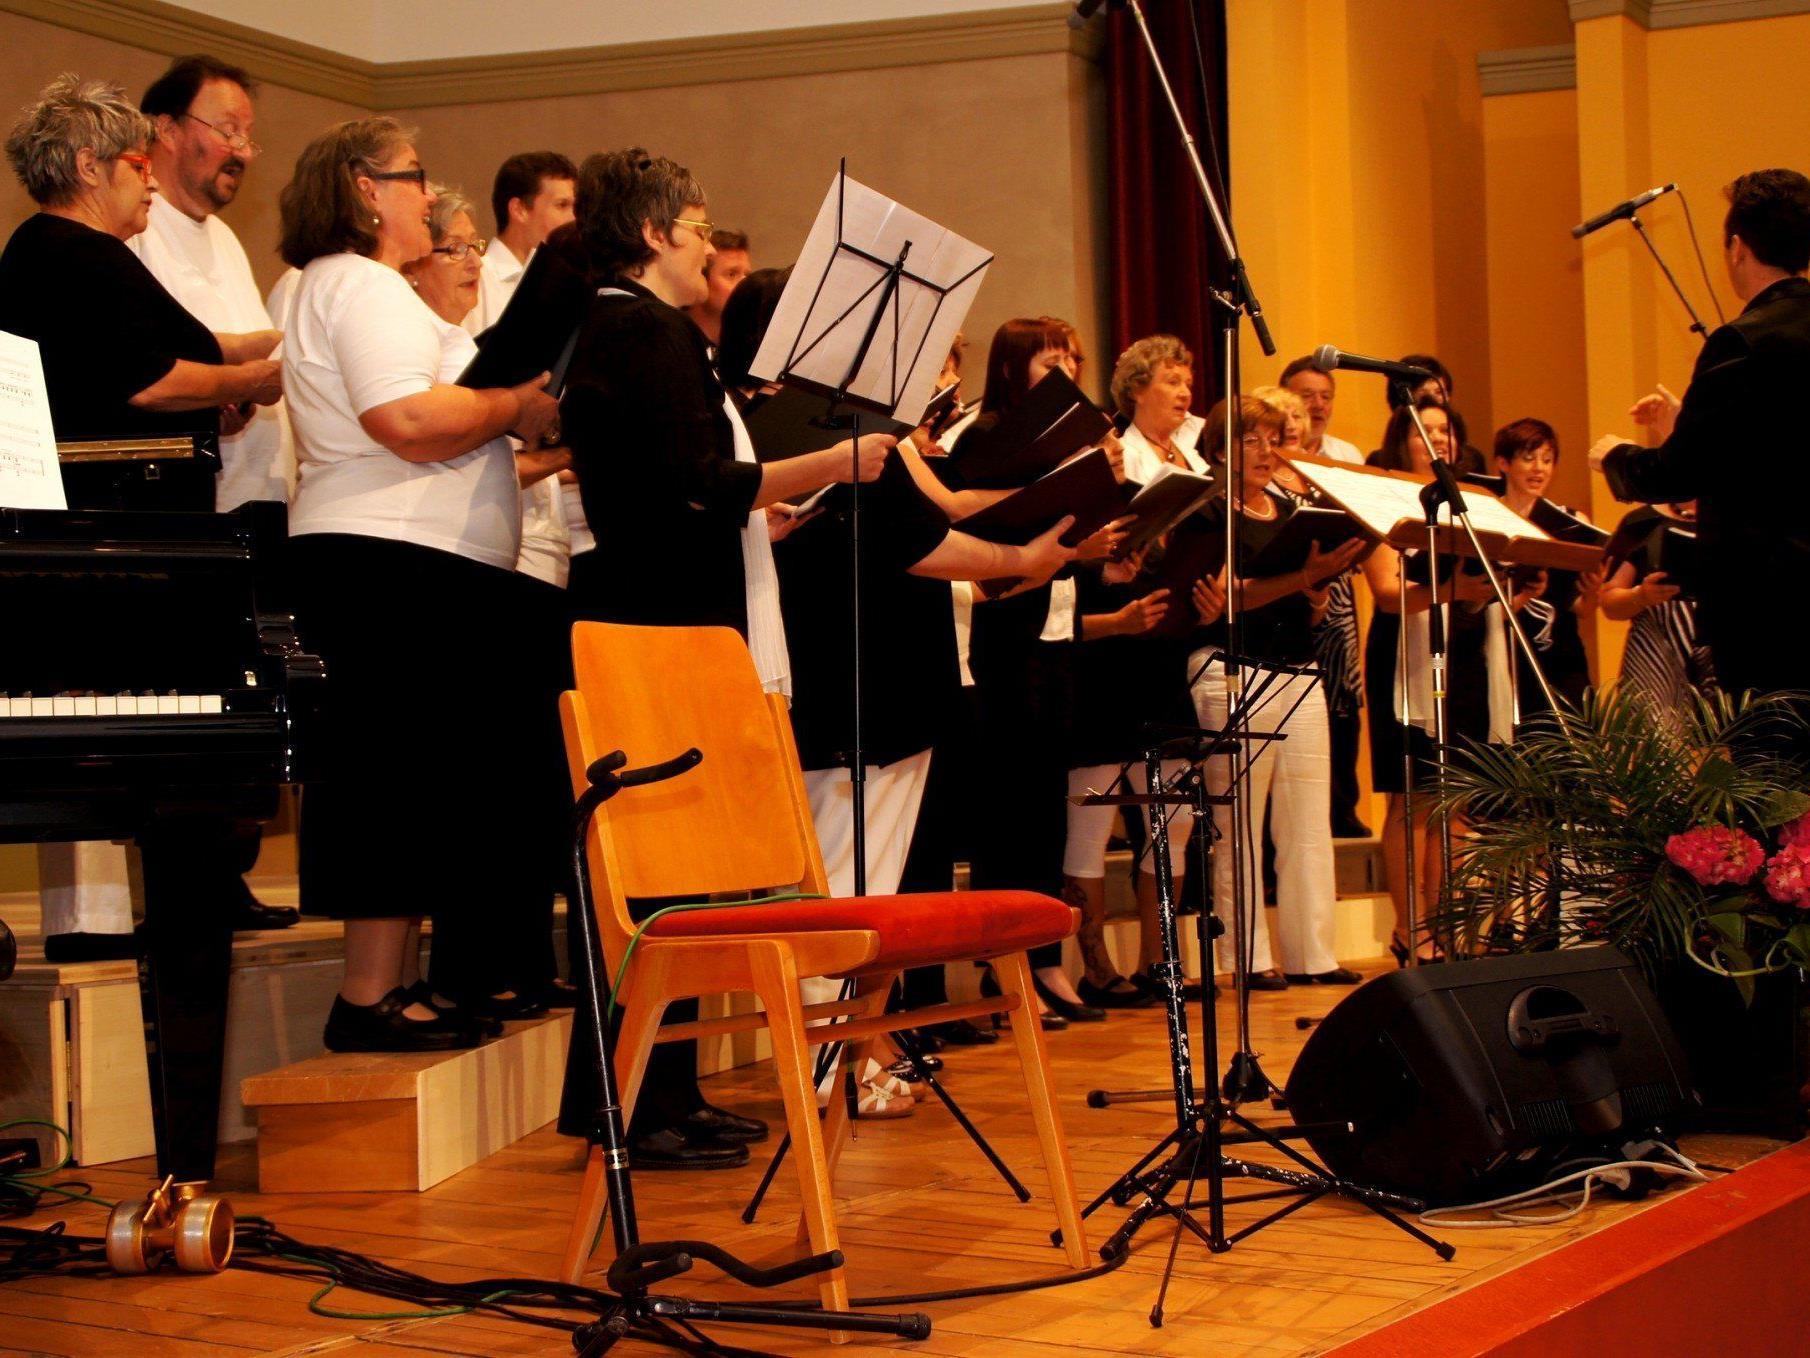 Der Nibelungenhort beim Konzert